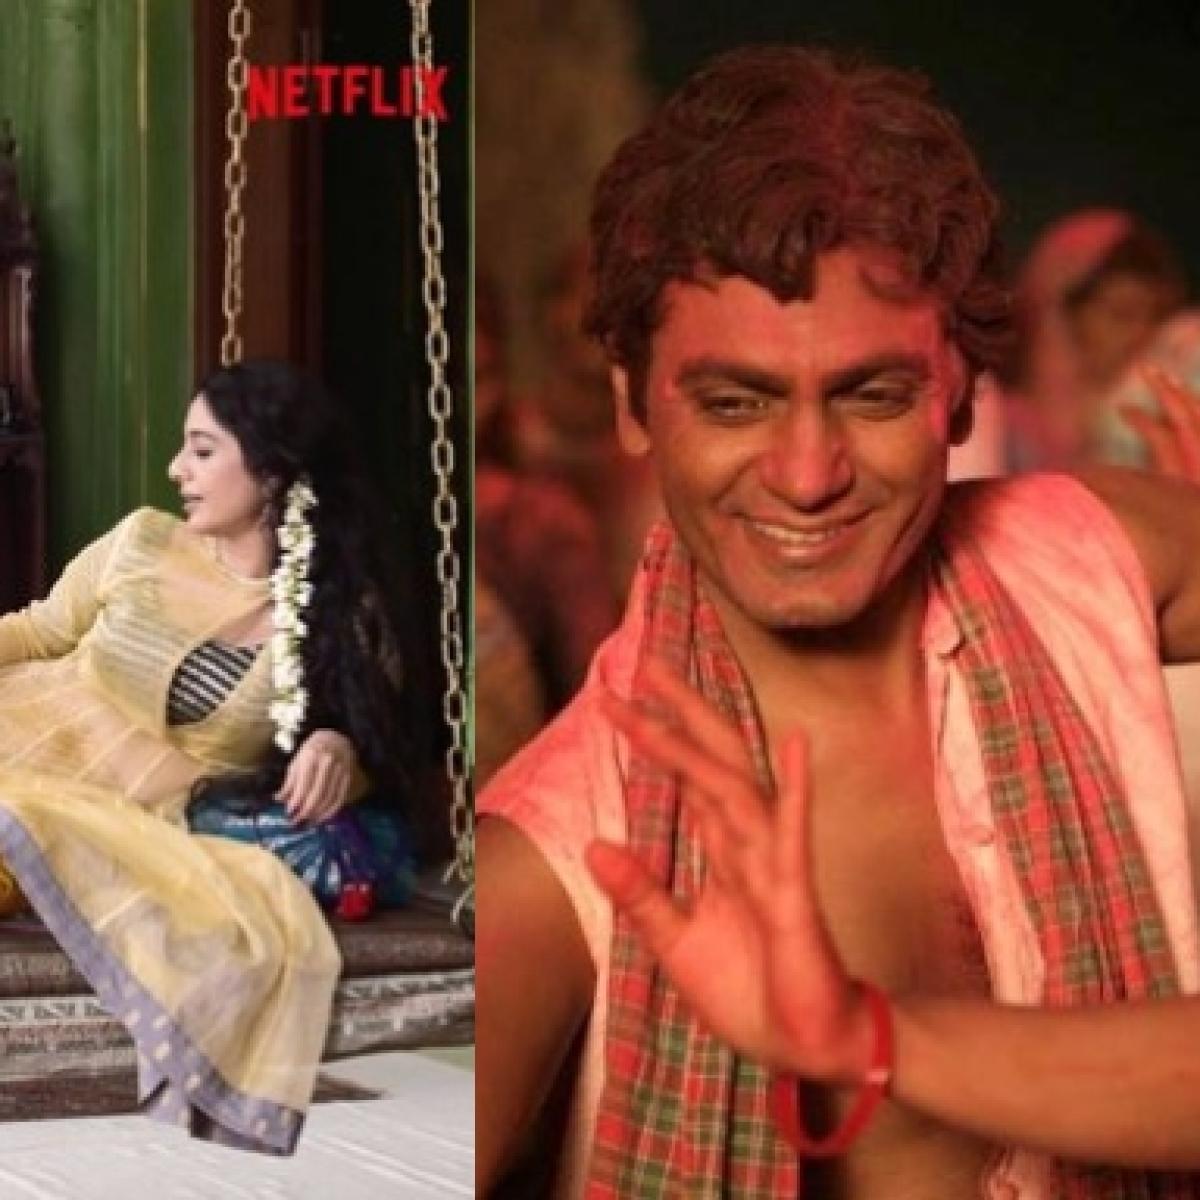 Ludo', 'A Suitable Boy', 'Toorbaz': Netflix India's 17 original films, series - what we know so far